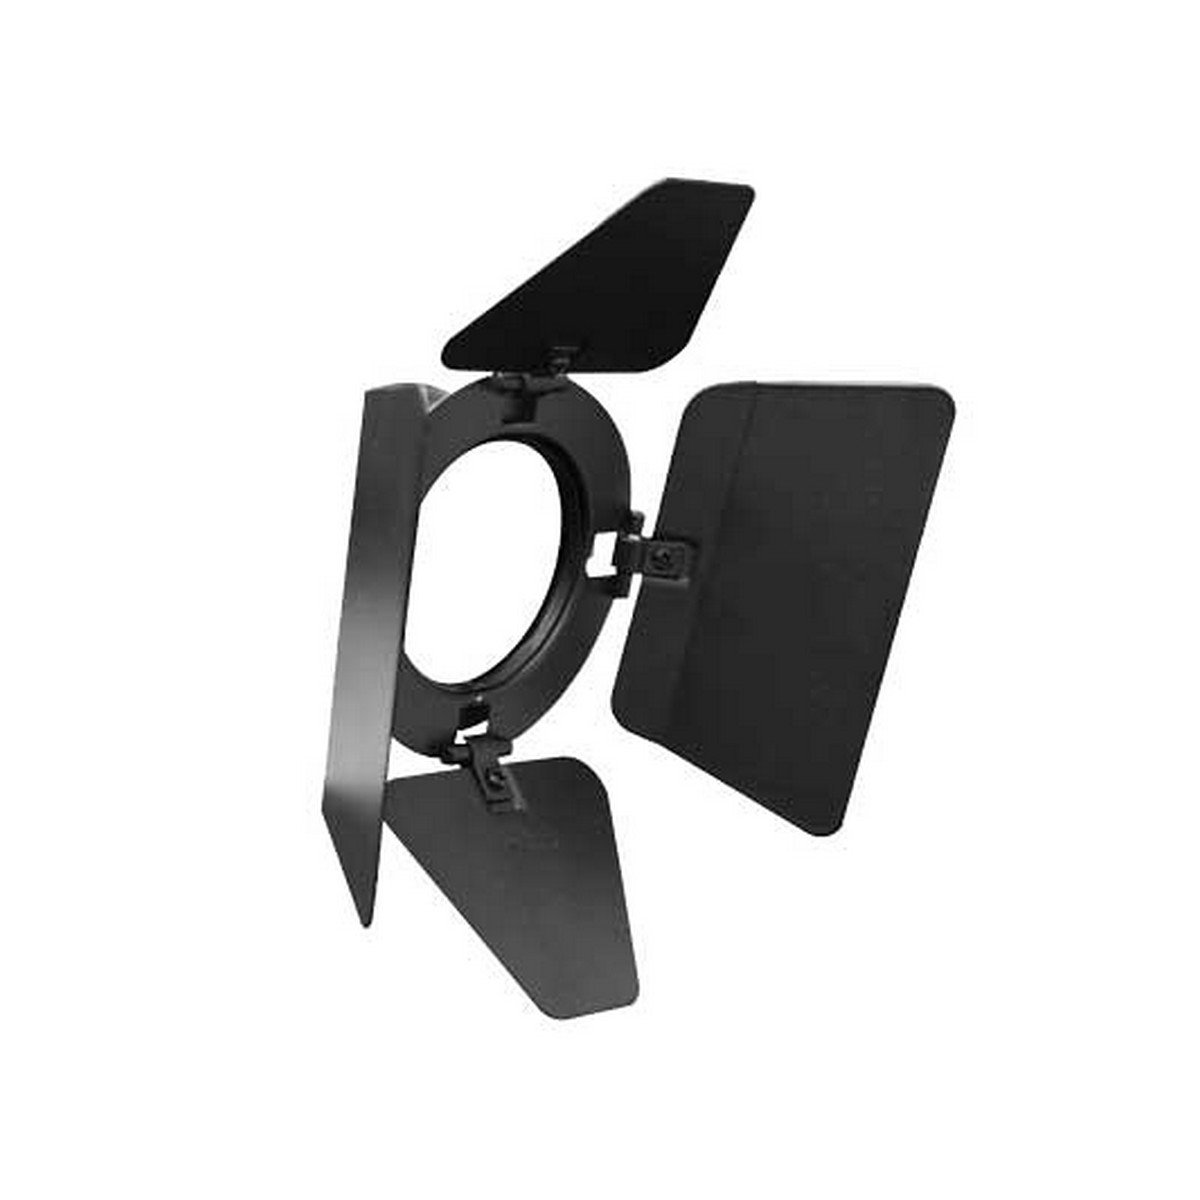 Odyssey Cases LSPAR20BDB Black Barn Door for PAR 20 Odyssey Light Fixtures